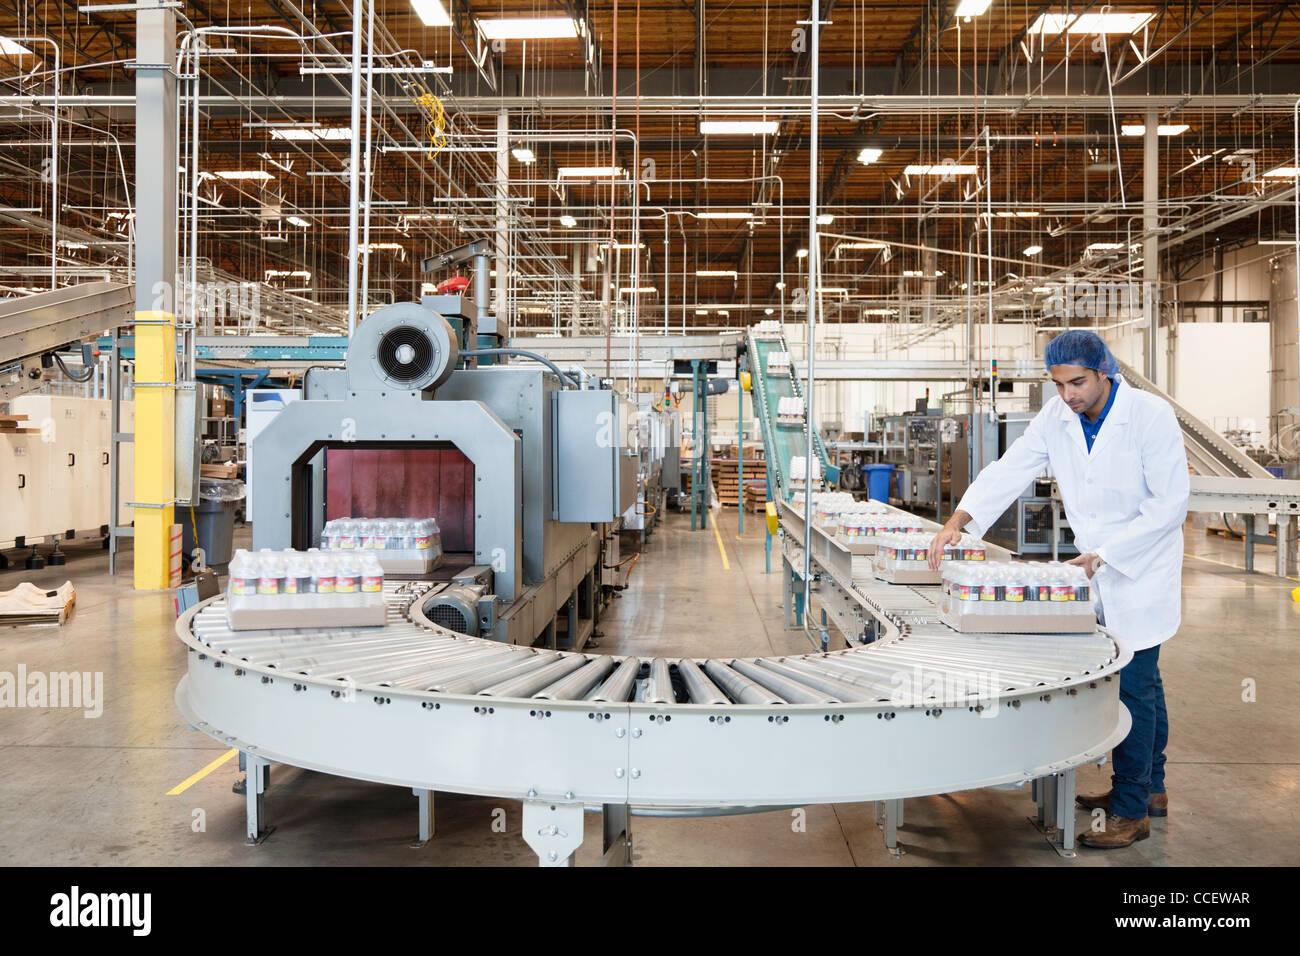 Mann arbeitet in der Abfüllung Fabrik Stockbild